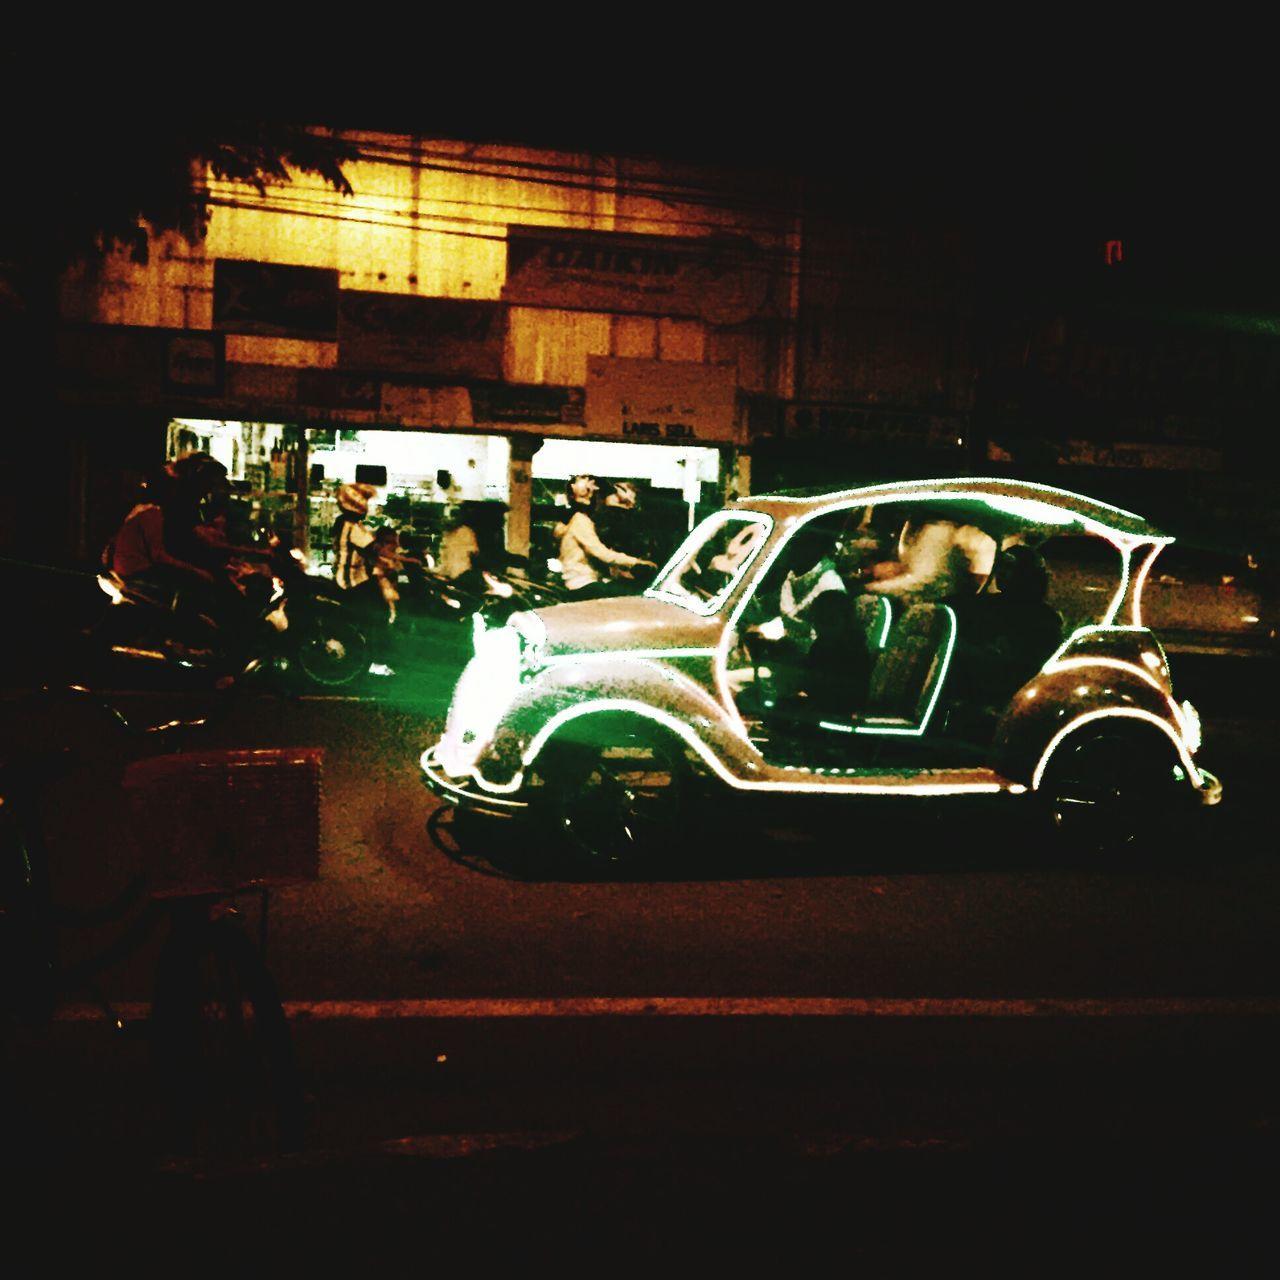 Night Photography LED Light Odong-odong